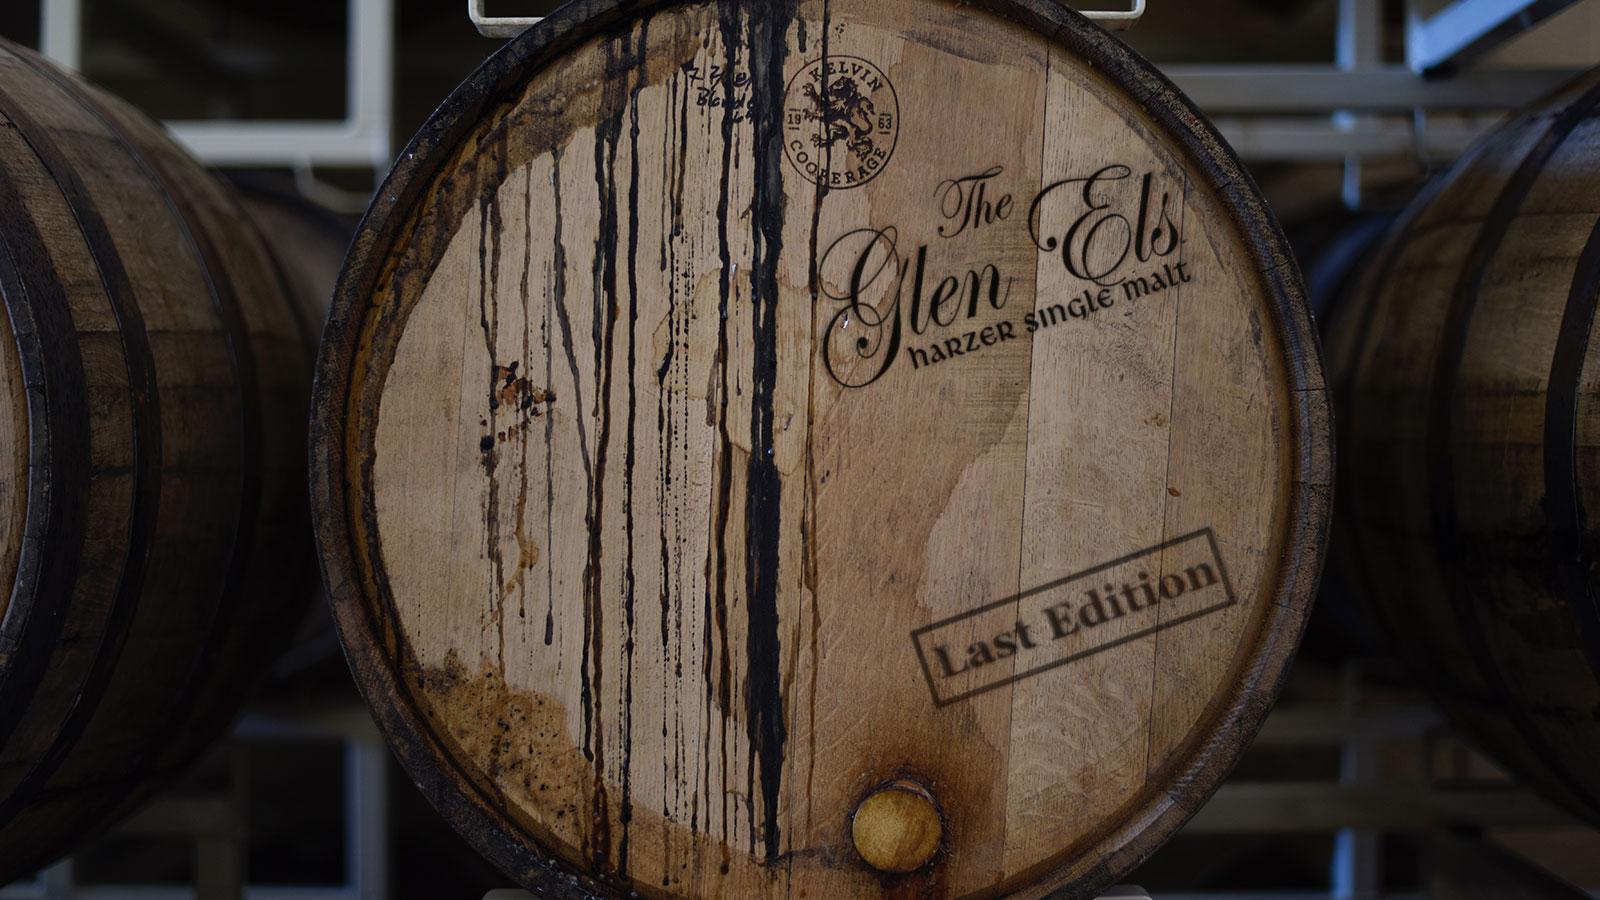 Tipp für Whisky-Sammler: The Glen Els Last Edition